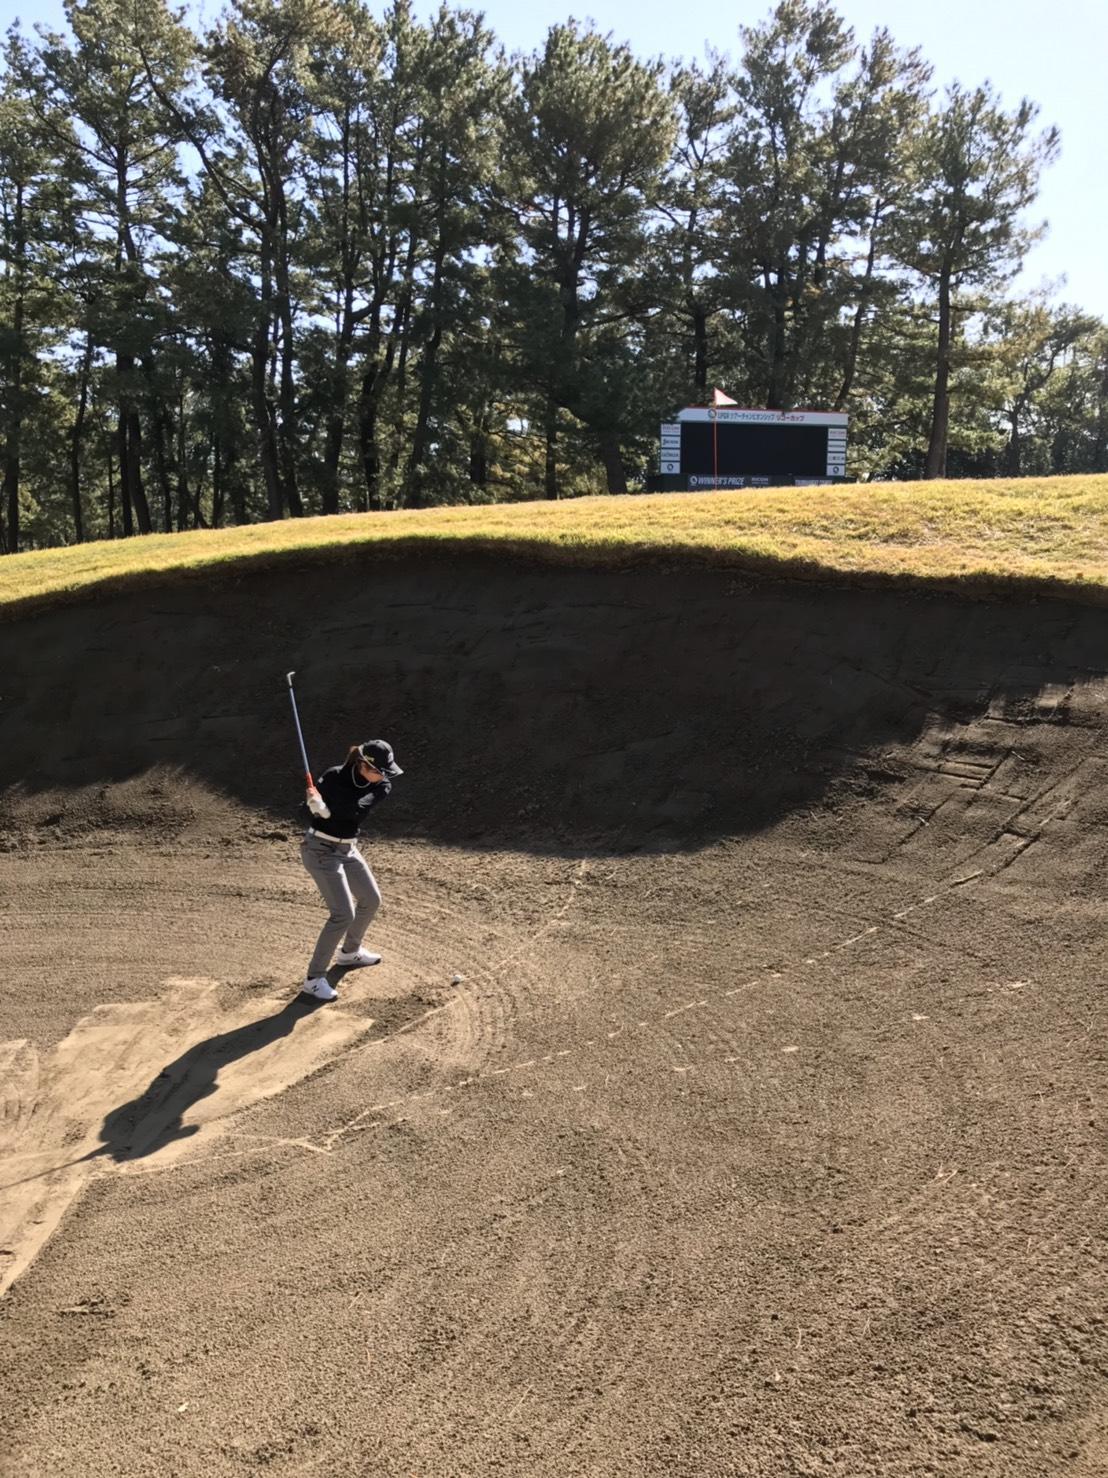 http://www.bs-golf.com/pro/5822bd4b39f4705440fcbe2fe2773b7106702cdd.JPG